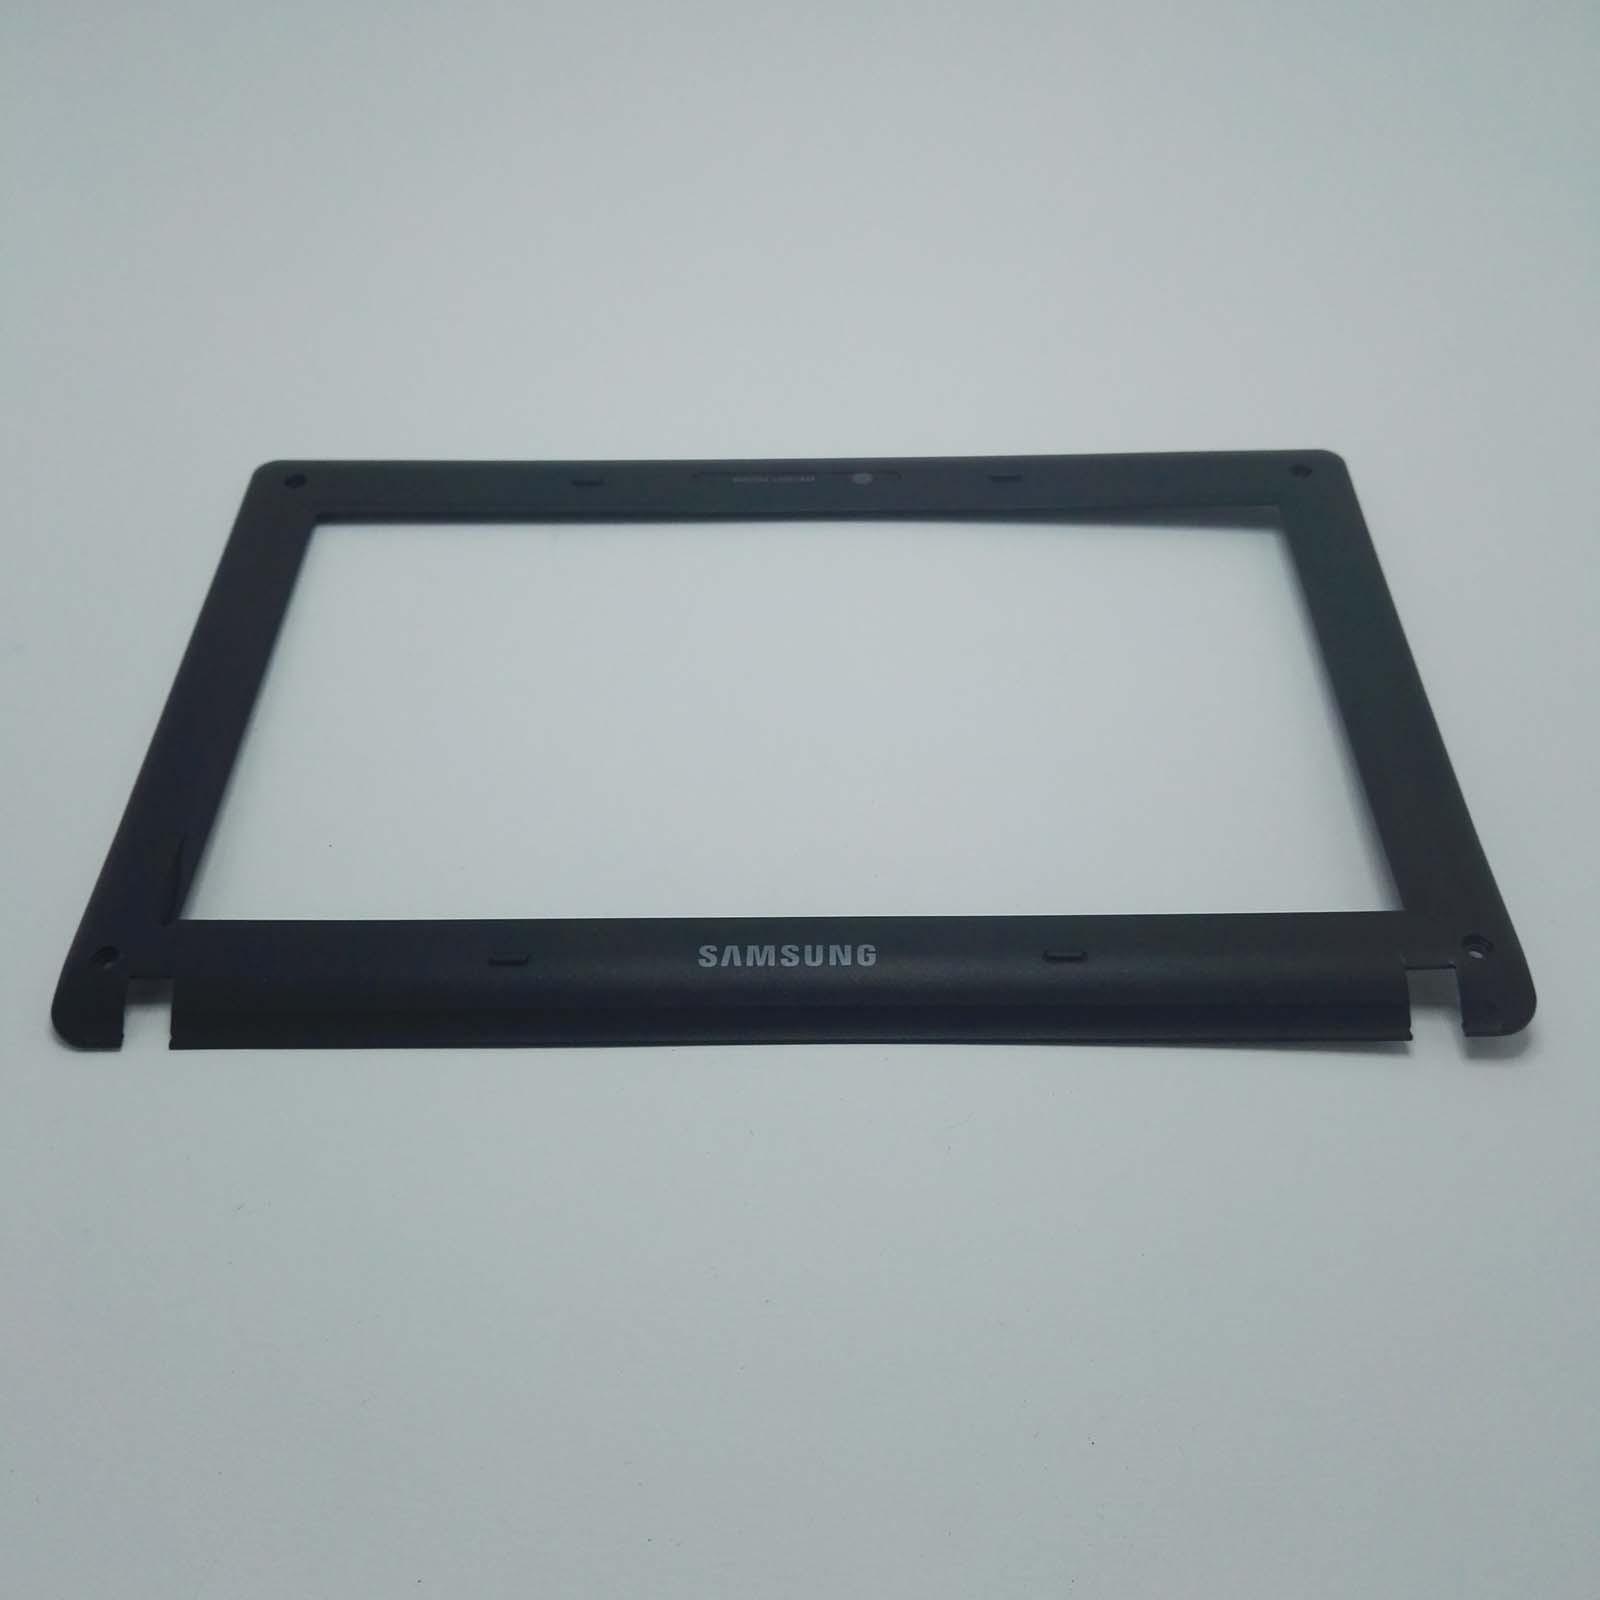 Cornice display schermo Samsung N150 NP-N150 BA75-02360B scocca nero black